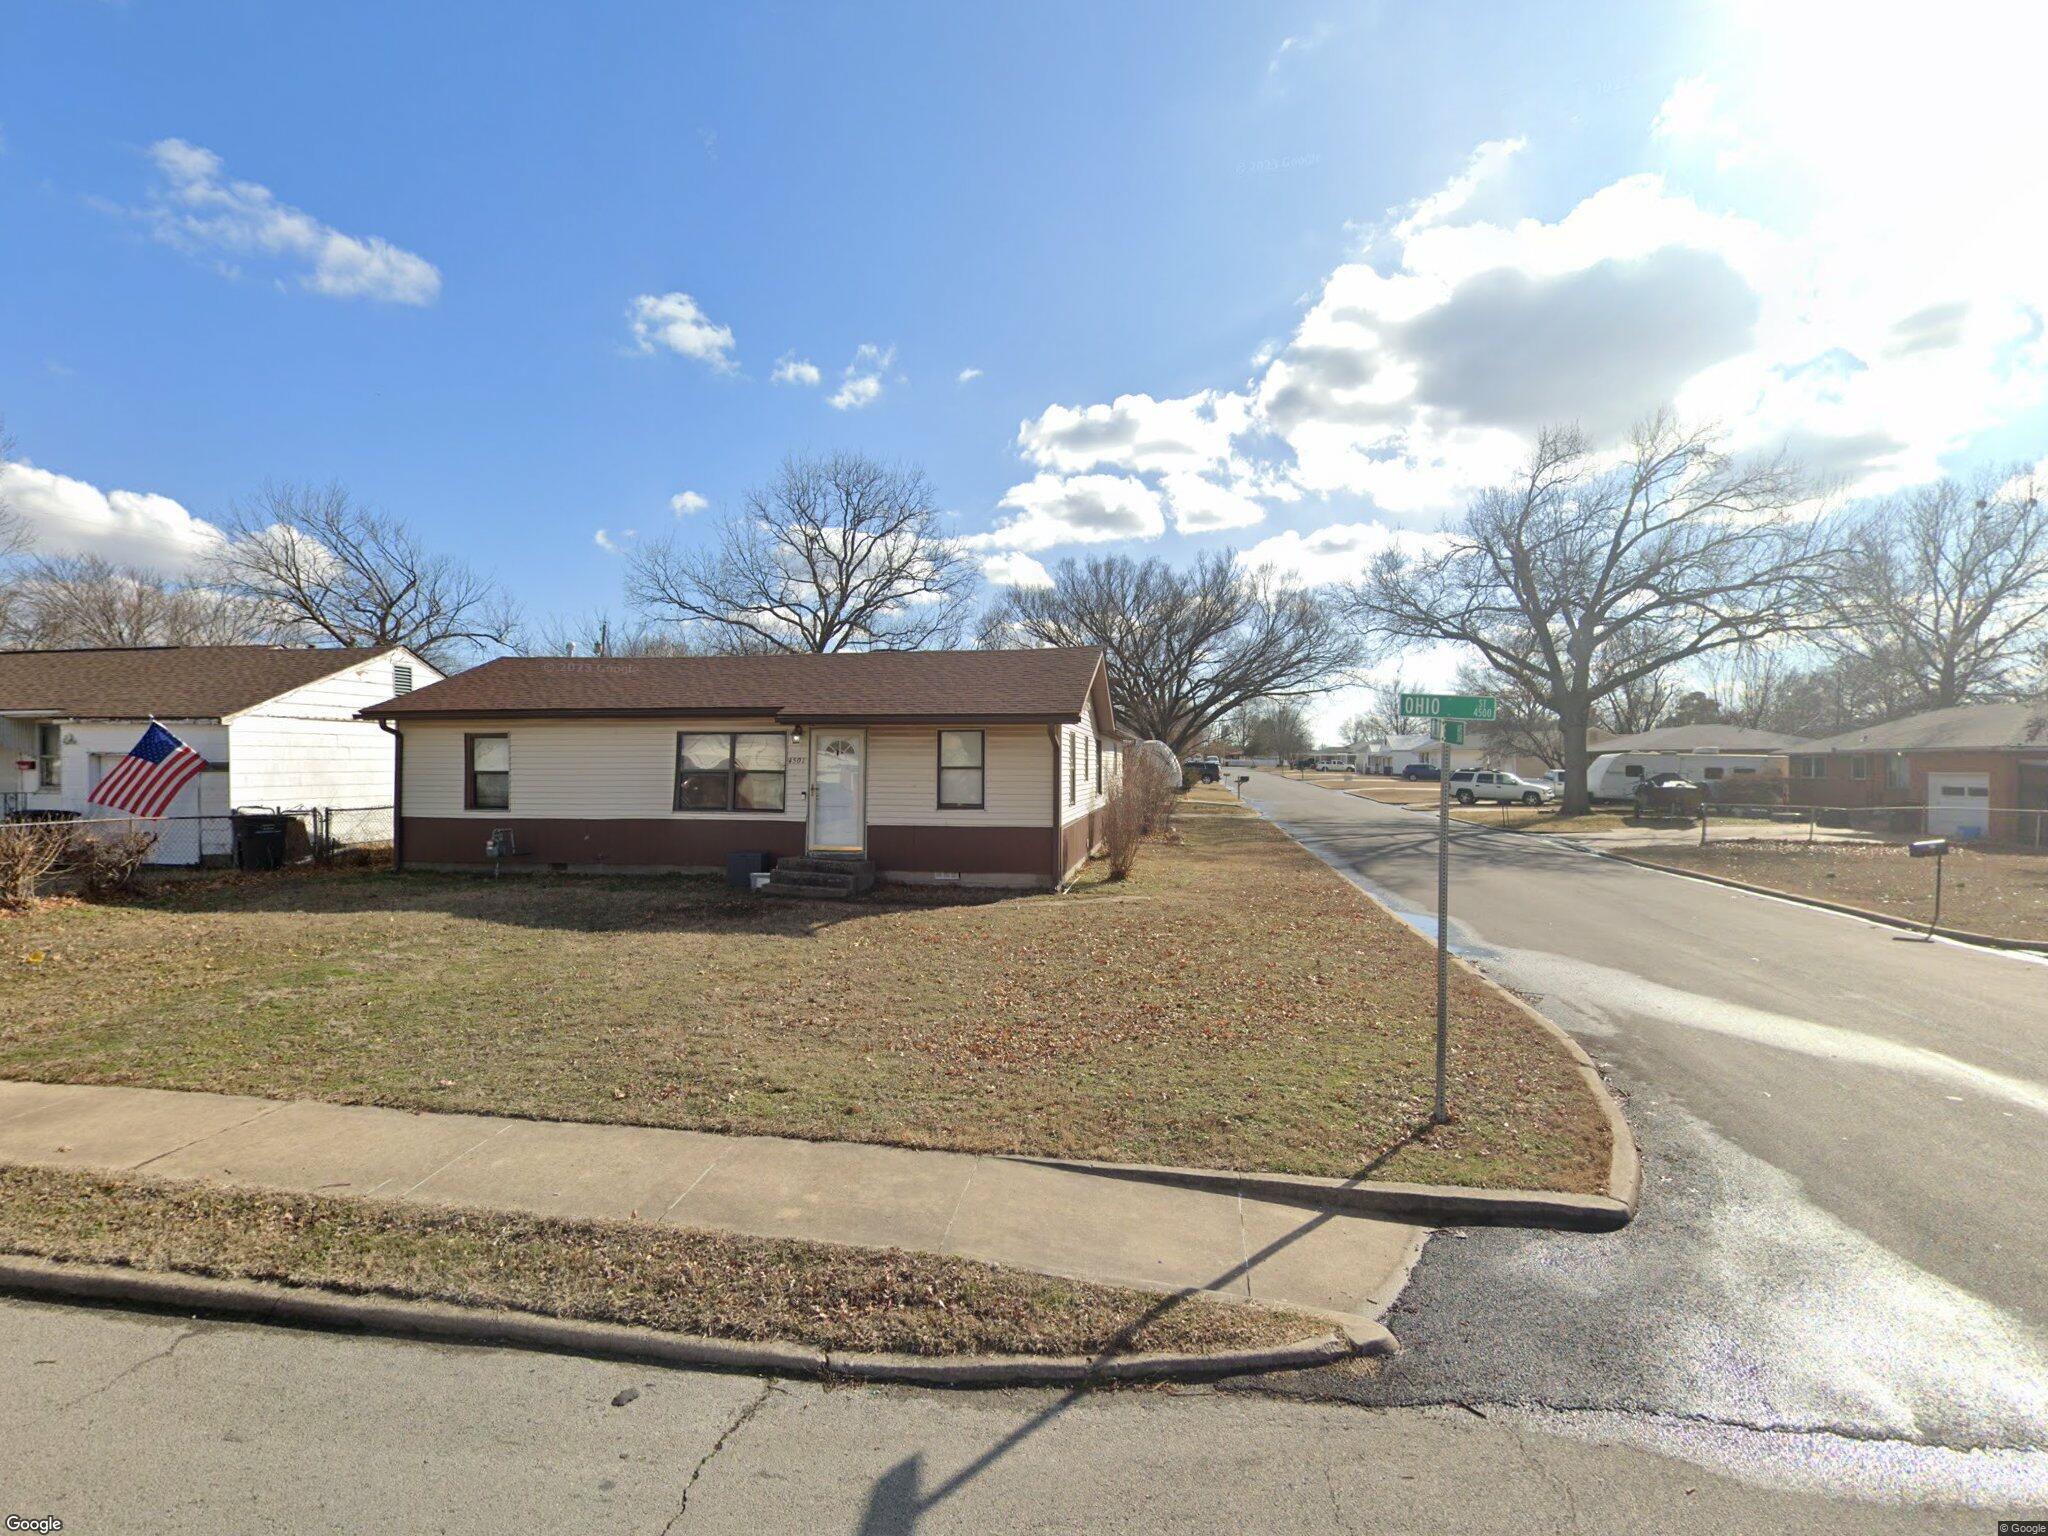 4501 Ohio St Bartlesville Ok 74006 Foreclosure Trulia